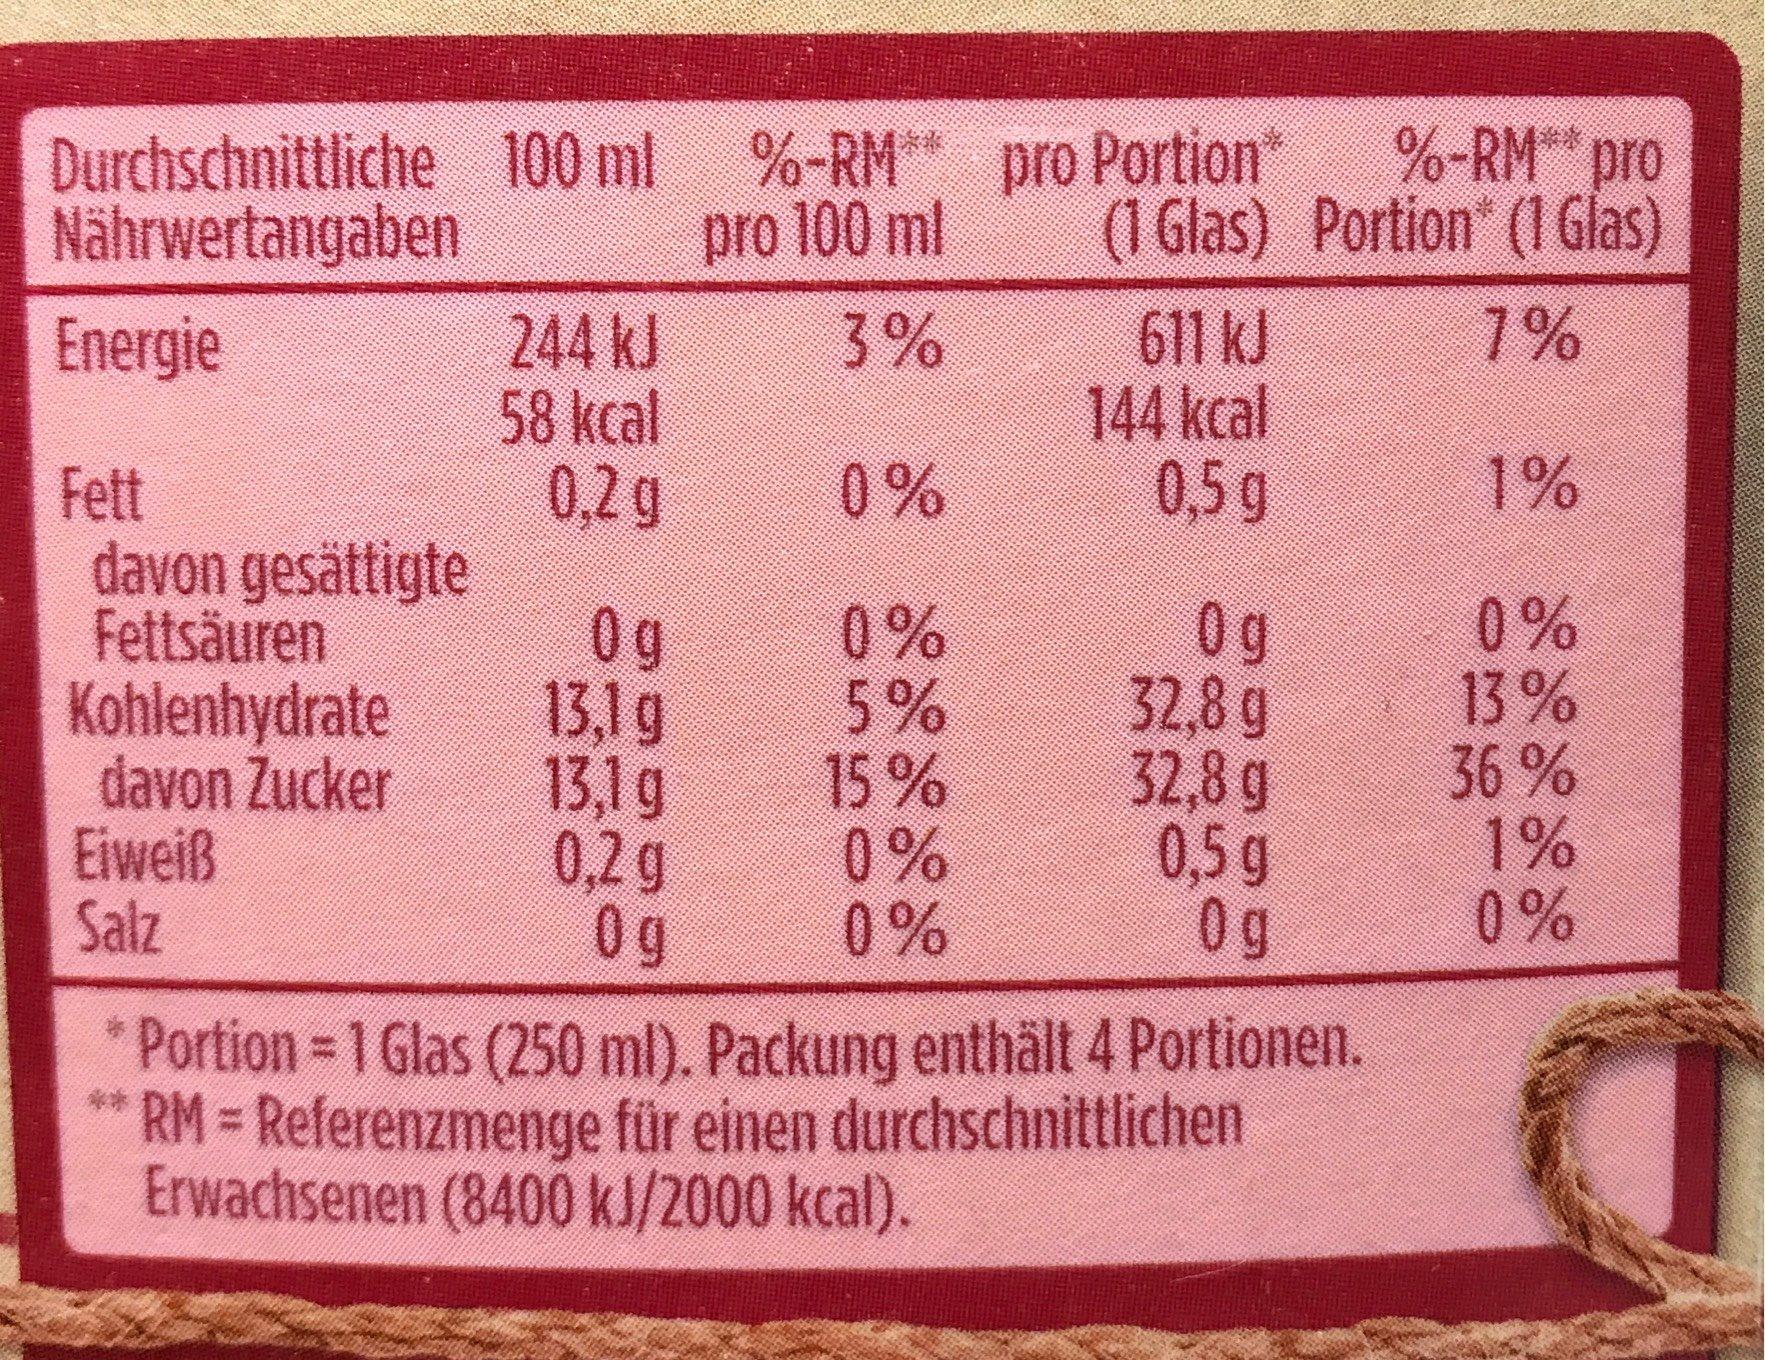 Image Result For Nektar Nutrition Facts